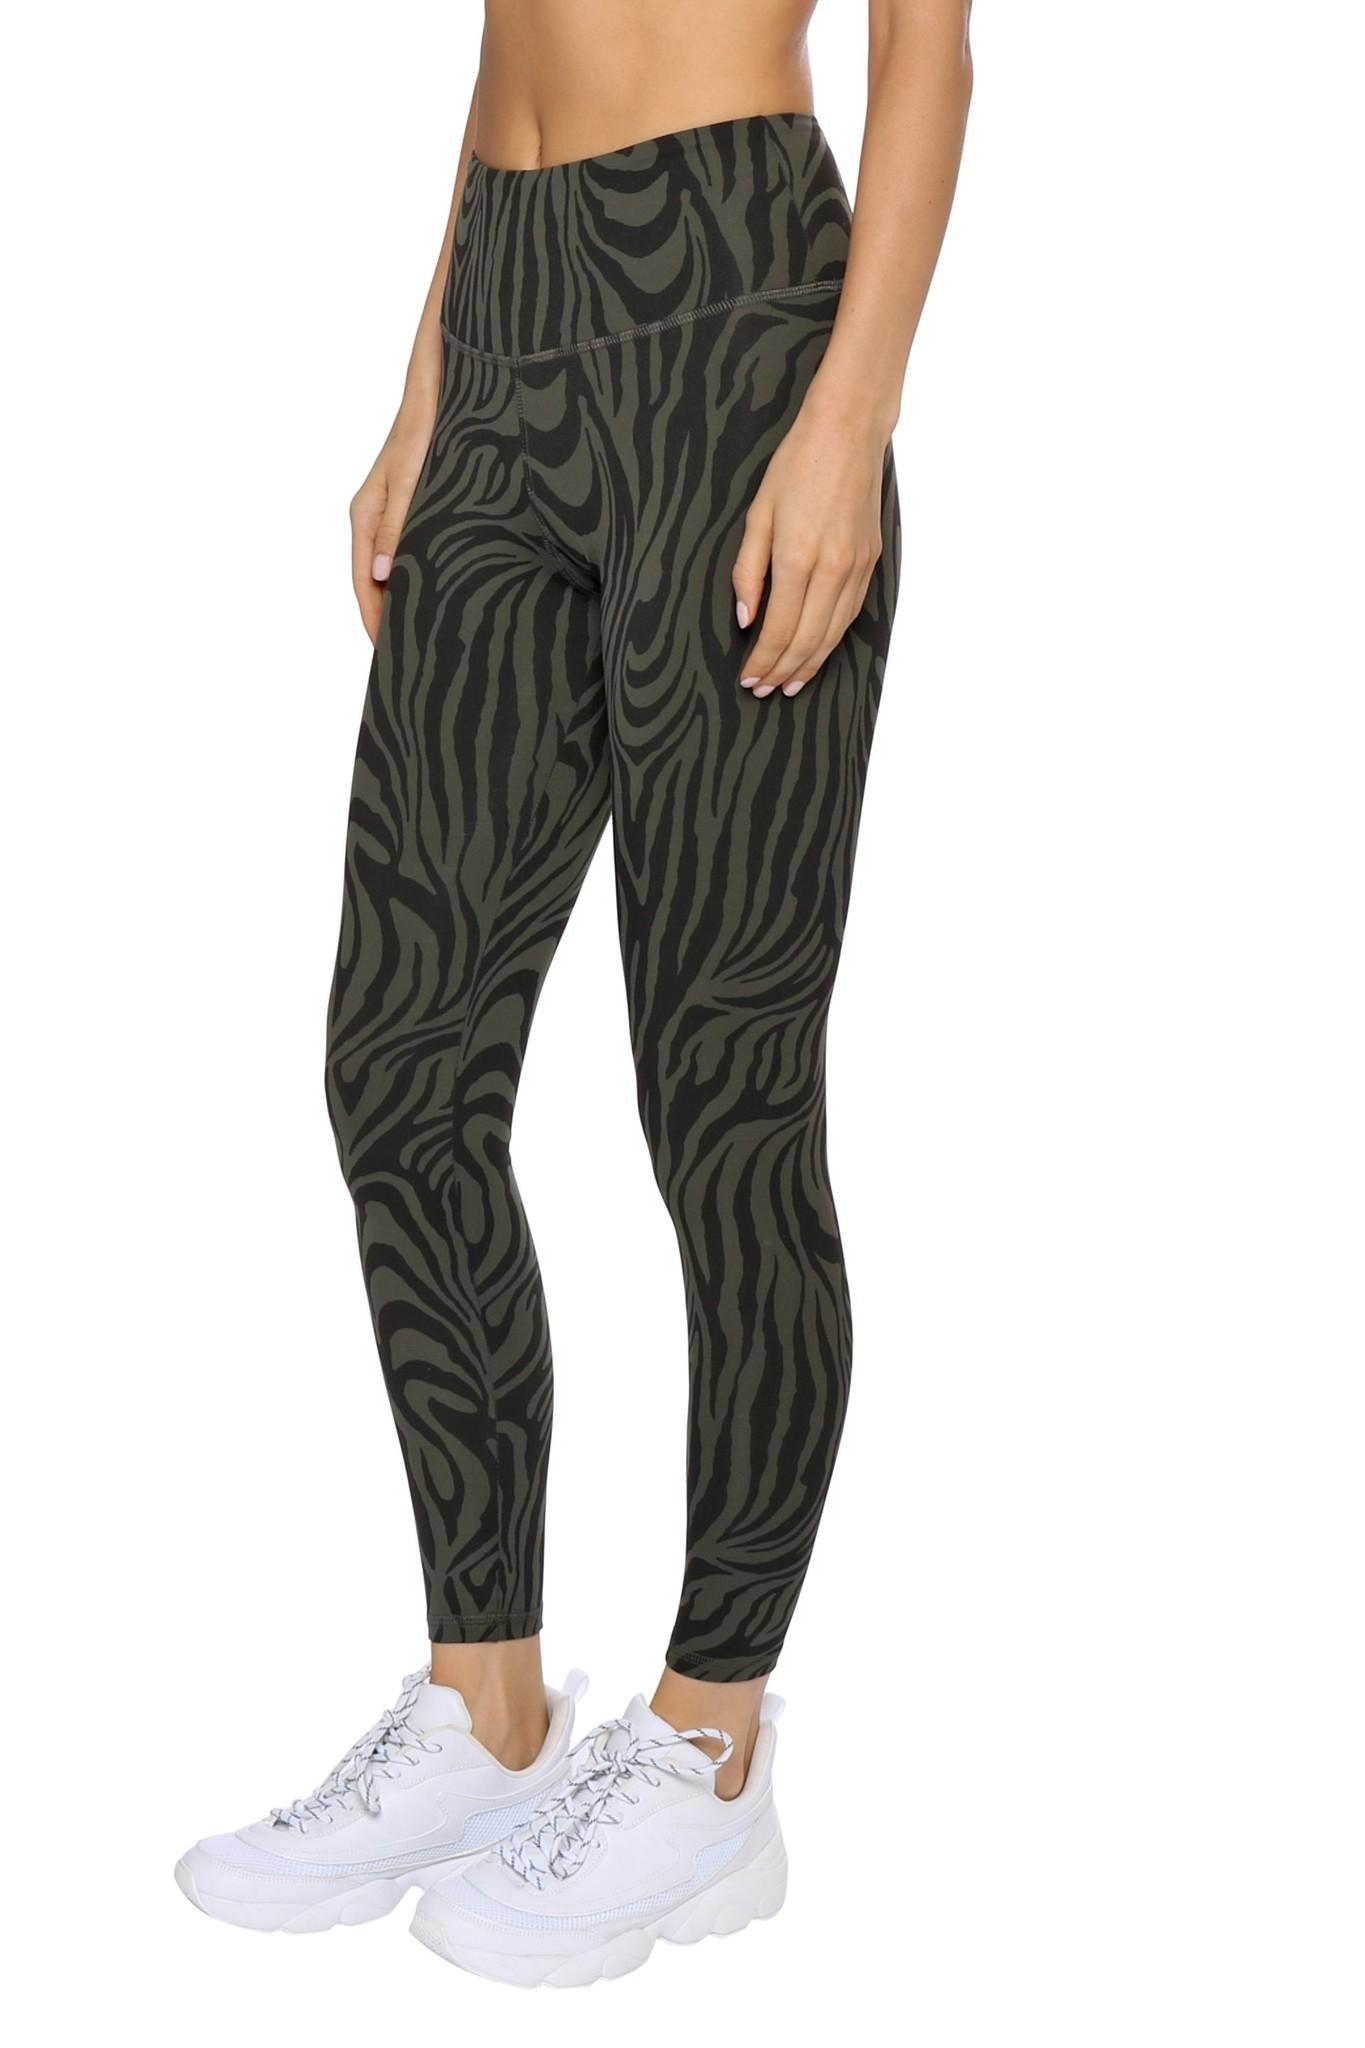 Teagan Ankle Olive Zebra